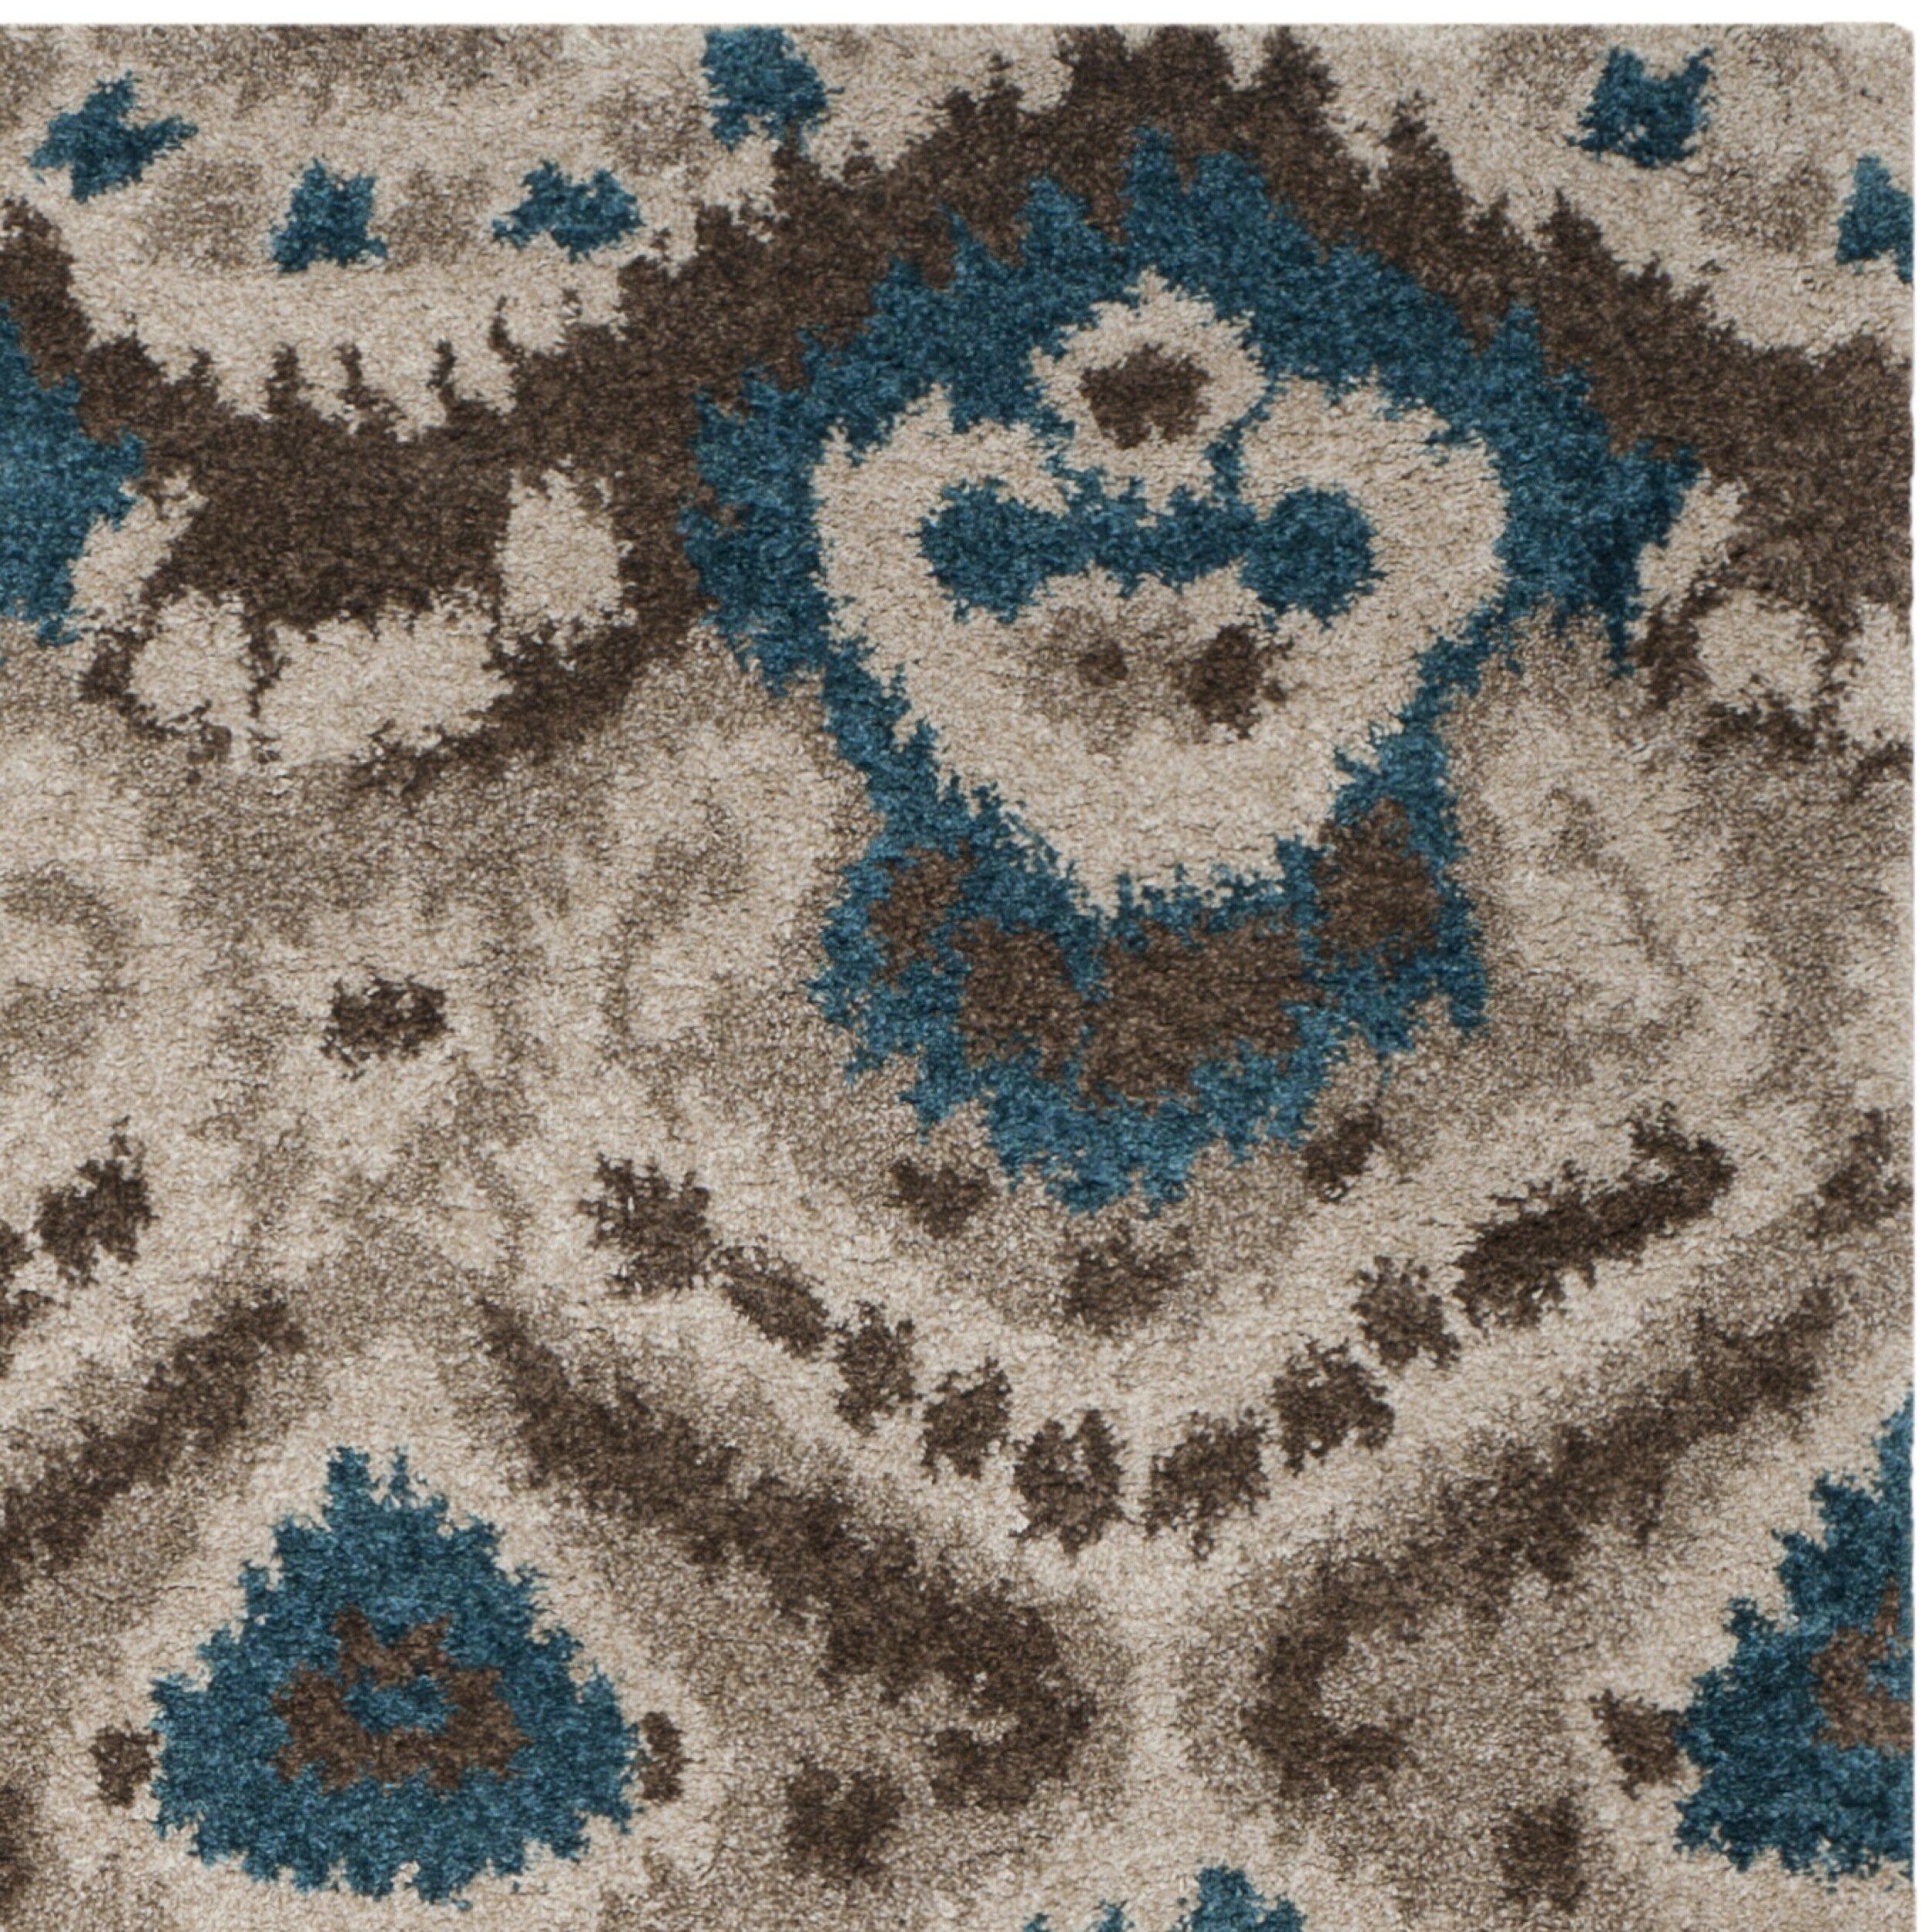 Safavieh Tibetan Brown Turquoise Ikat Rug & Reviews